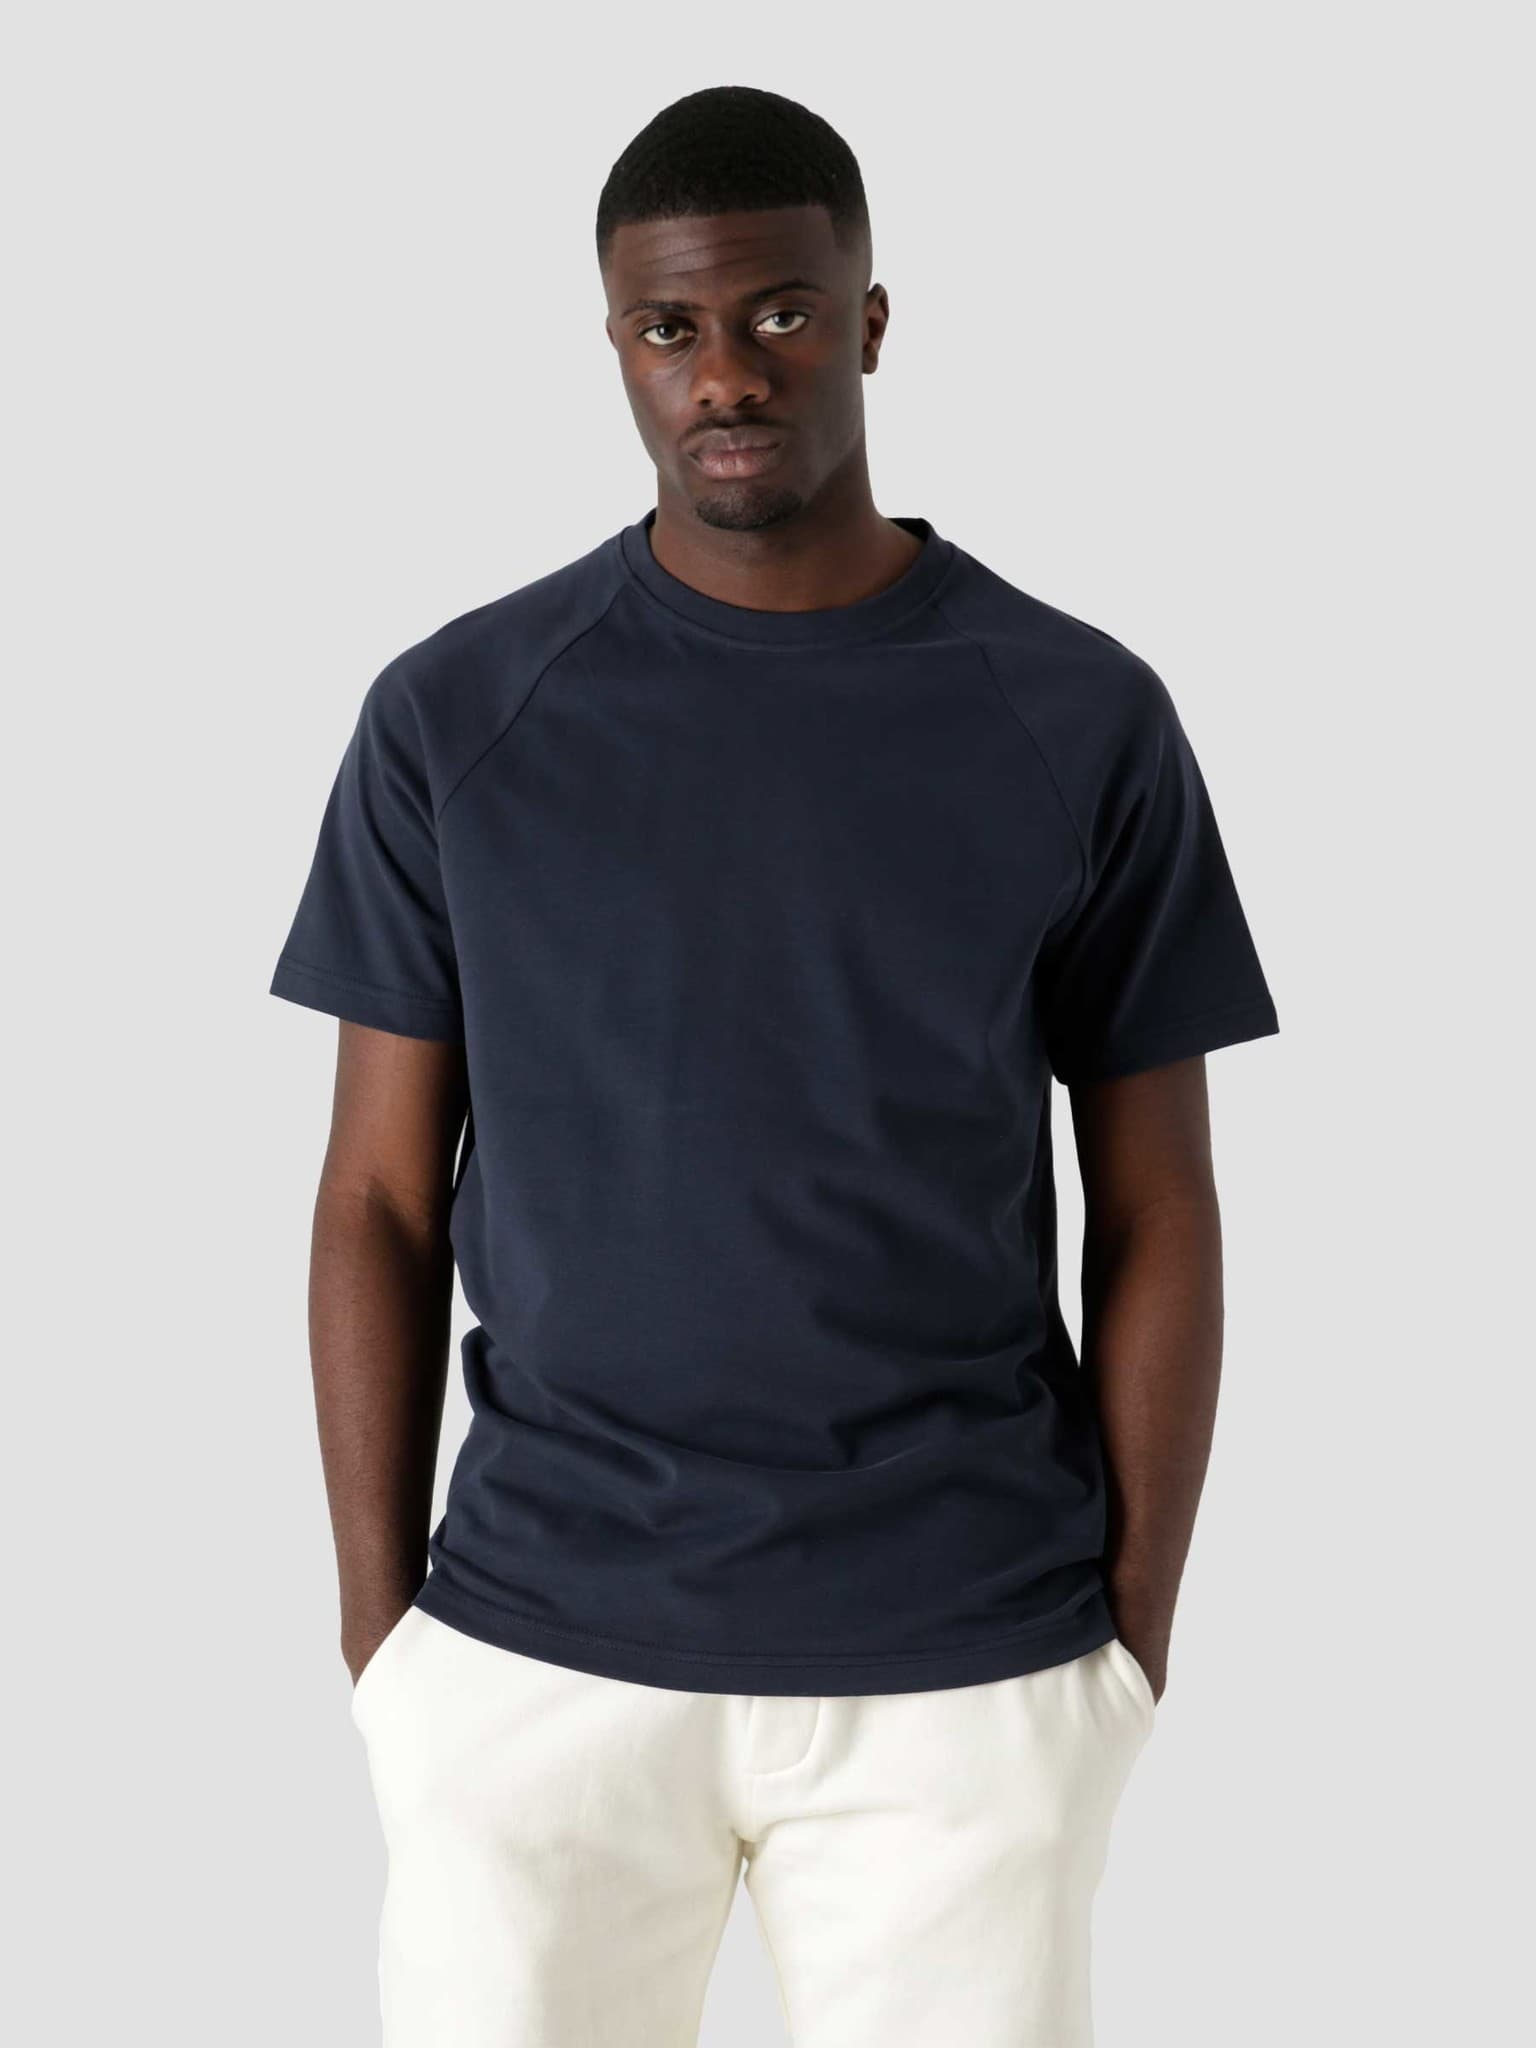 QB302 Heavy Raglan T-shirt Navy